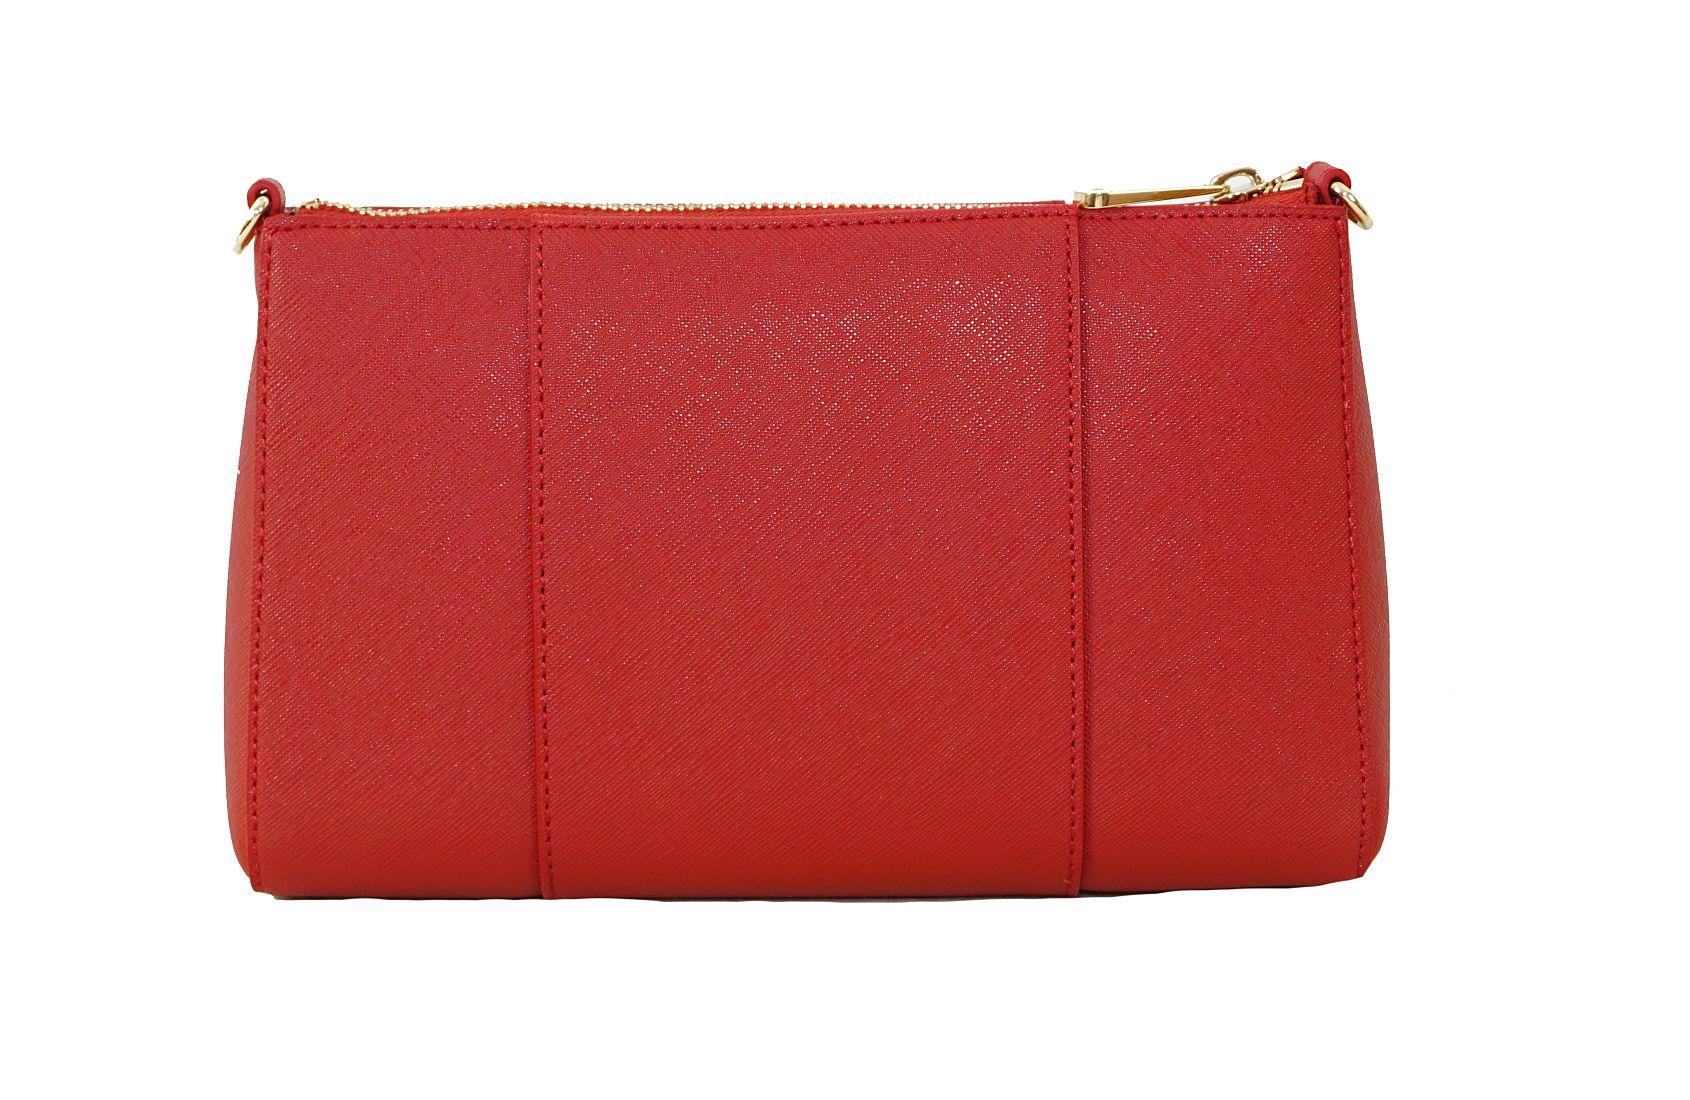 Armani Jeans Tasche Handtasche f. Damen 922544 CC857 00176 Bordeaux HW16